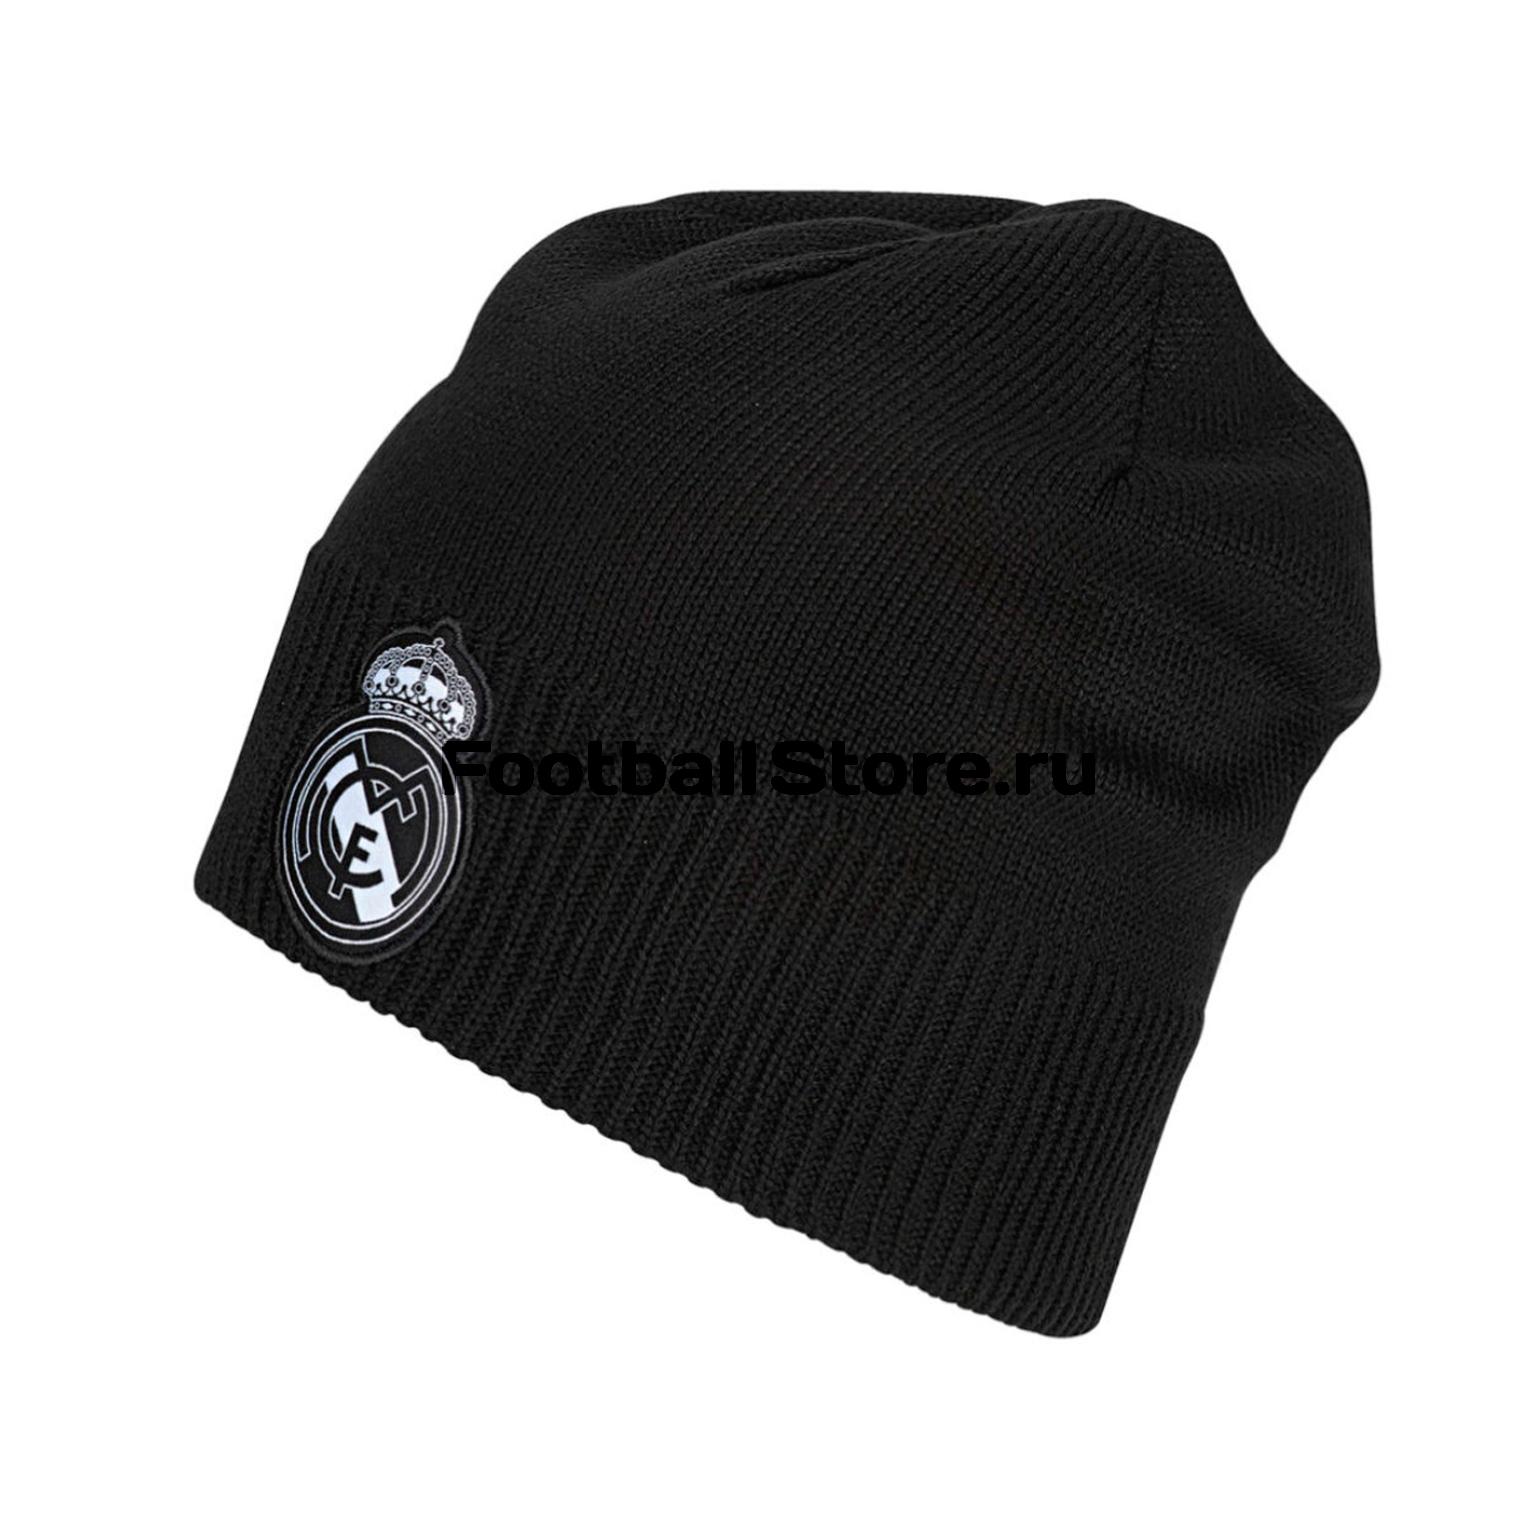 Real Madrid Adidas Шапка Adidas Real Madrid Beanie S94884 шапка спортивная adidas fm beanie m30735